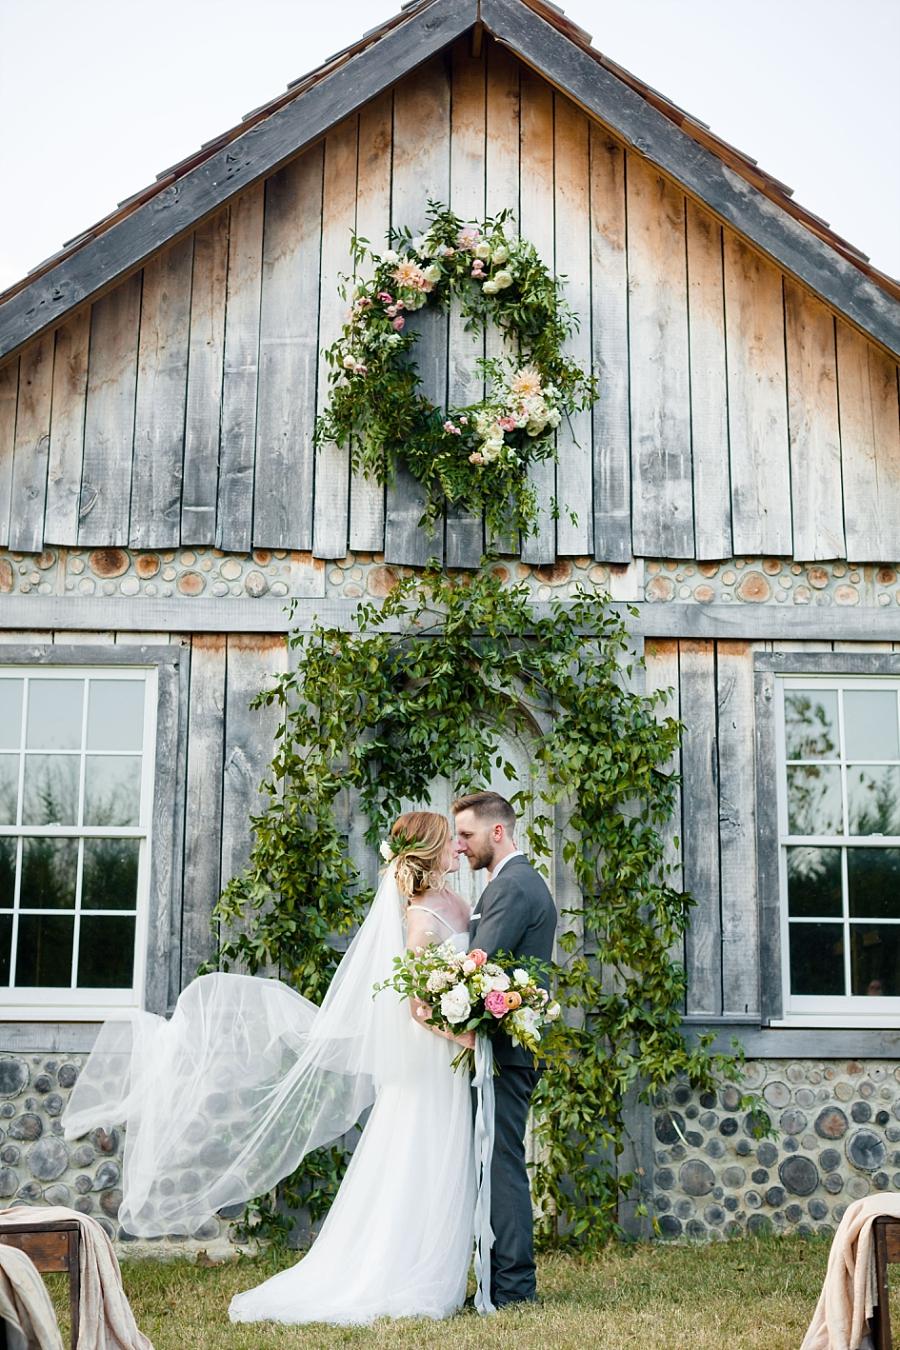 Stacy-Anderson-Photography-Nashville-Houston-Destination-Wedding-Photographer_0036-1.jpg